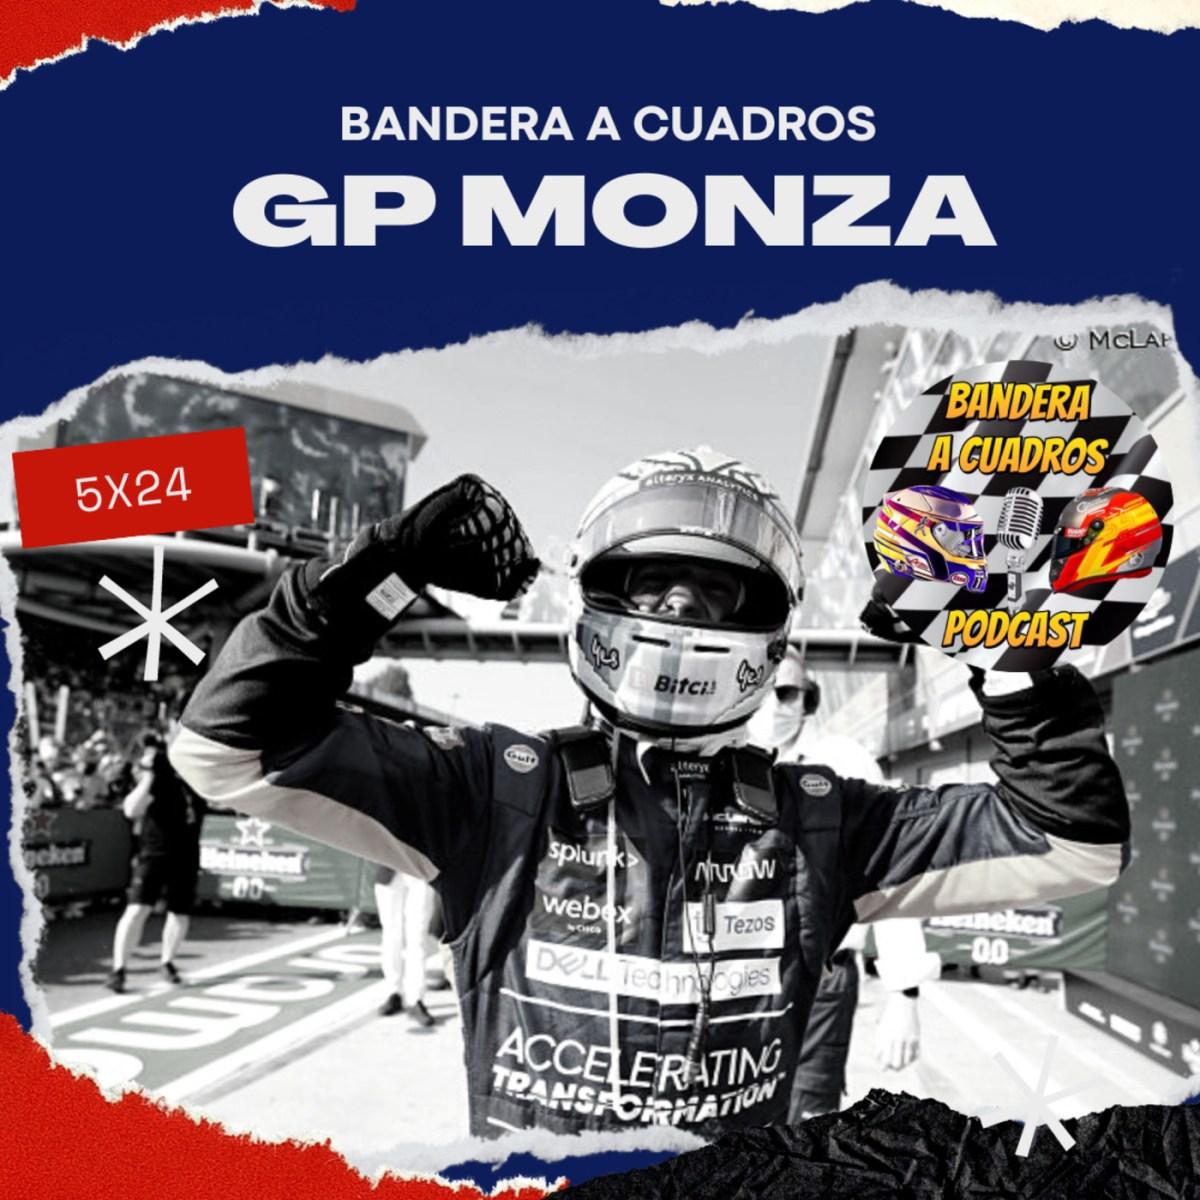 F1 Bandera a Cuadros 5×24 – GP Monza 2021 Doblete de Mclaren